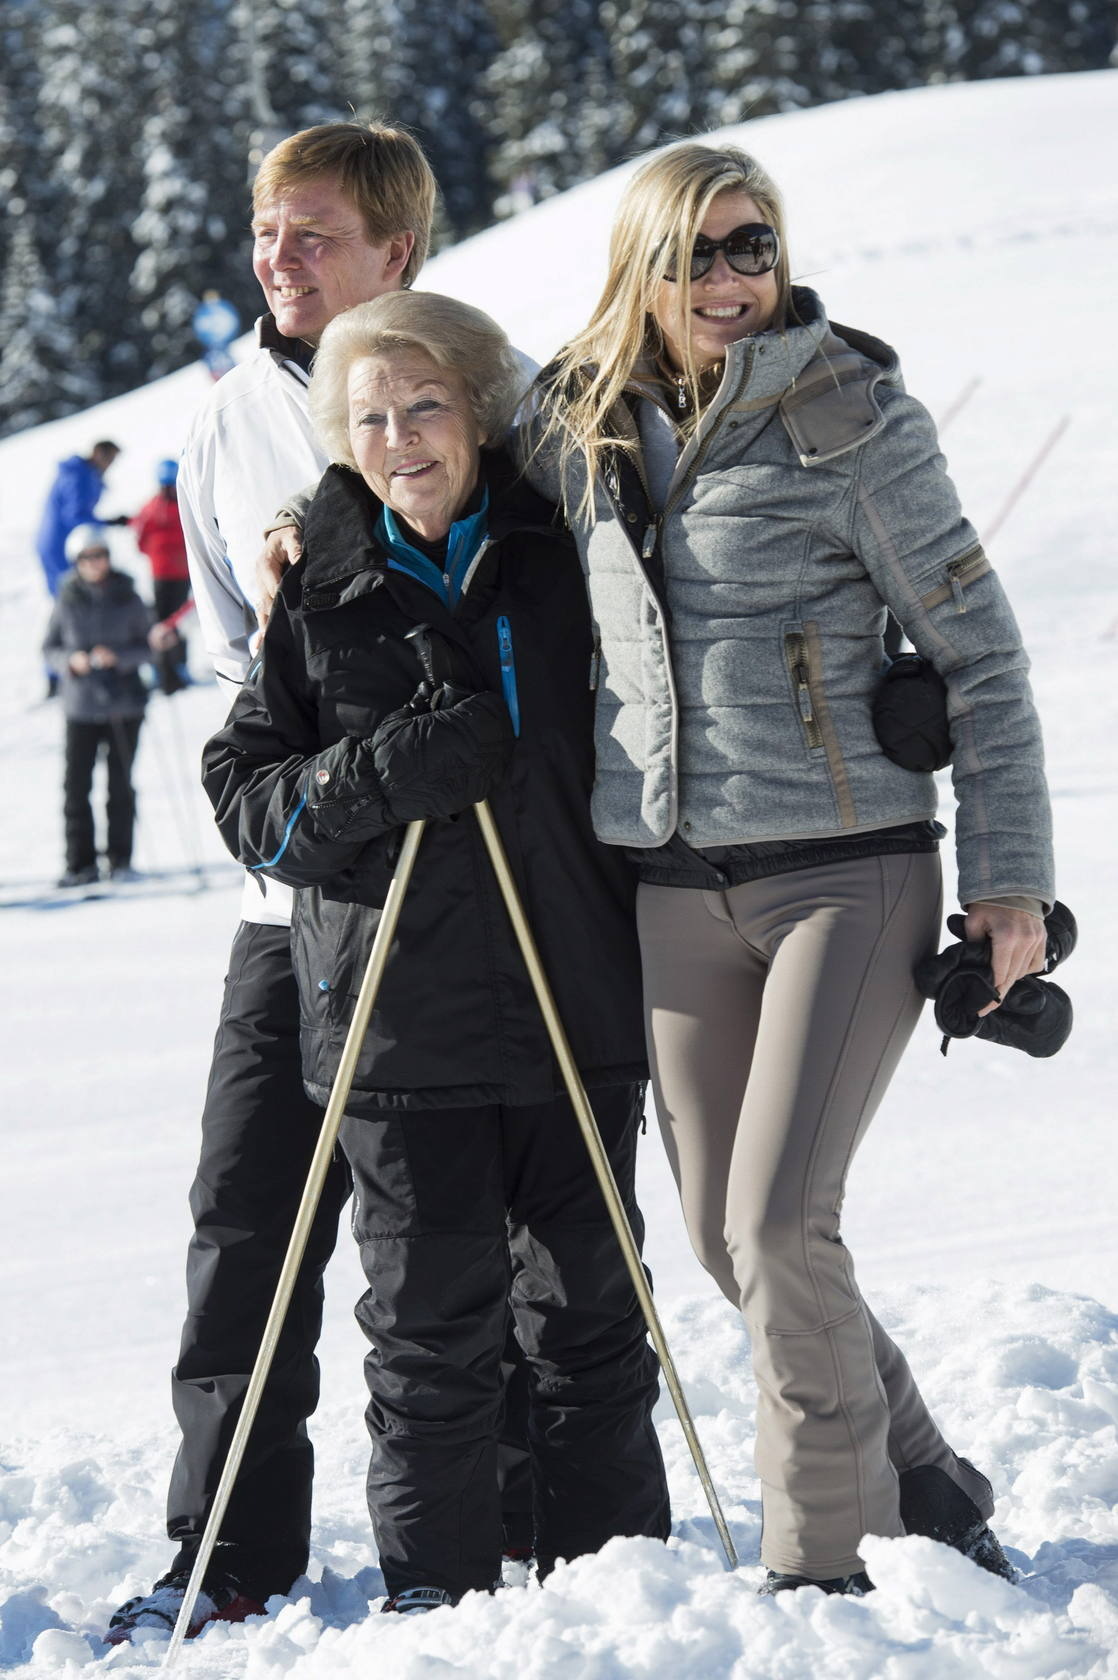 La Familia Real holandesa, en la nieve